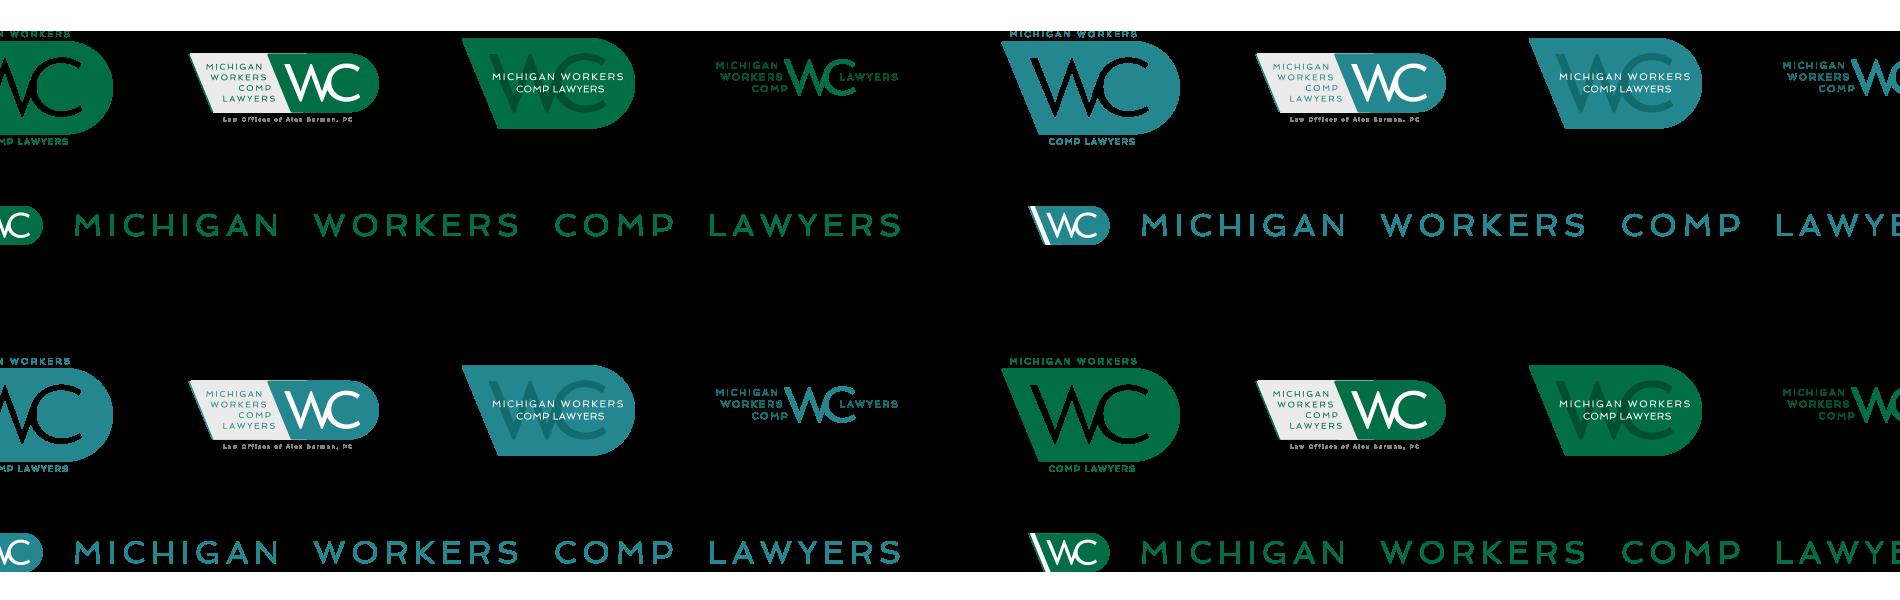 MWCL_06_LogoOptions